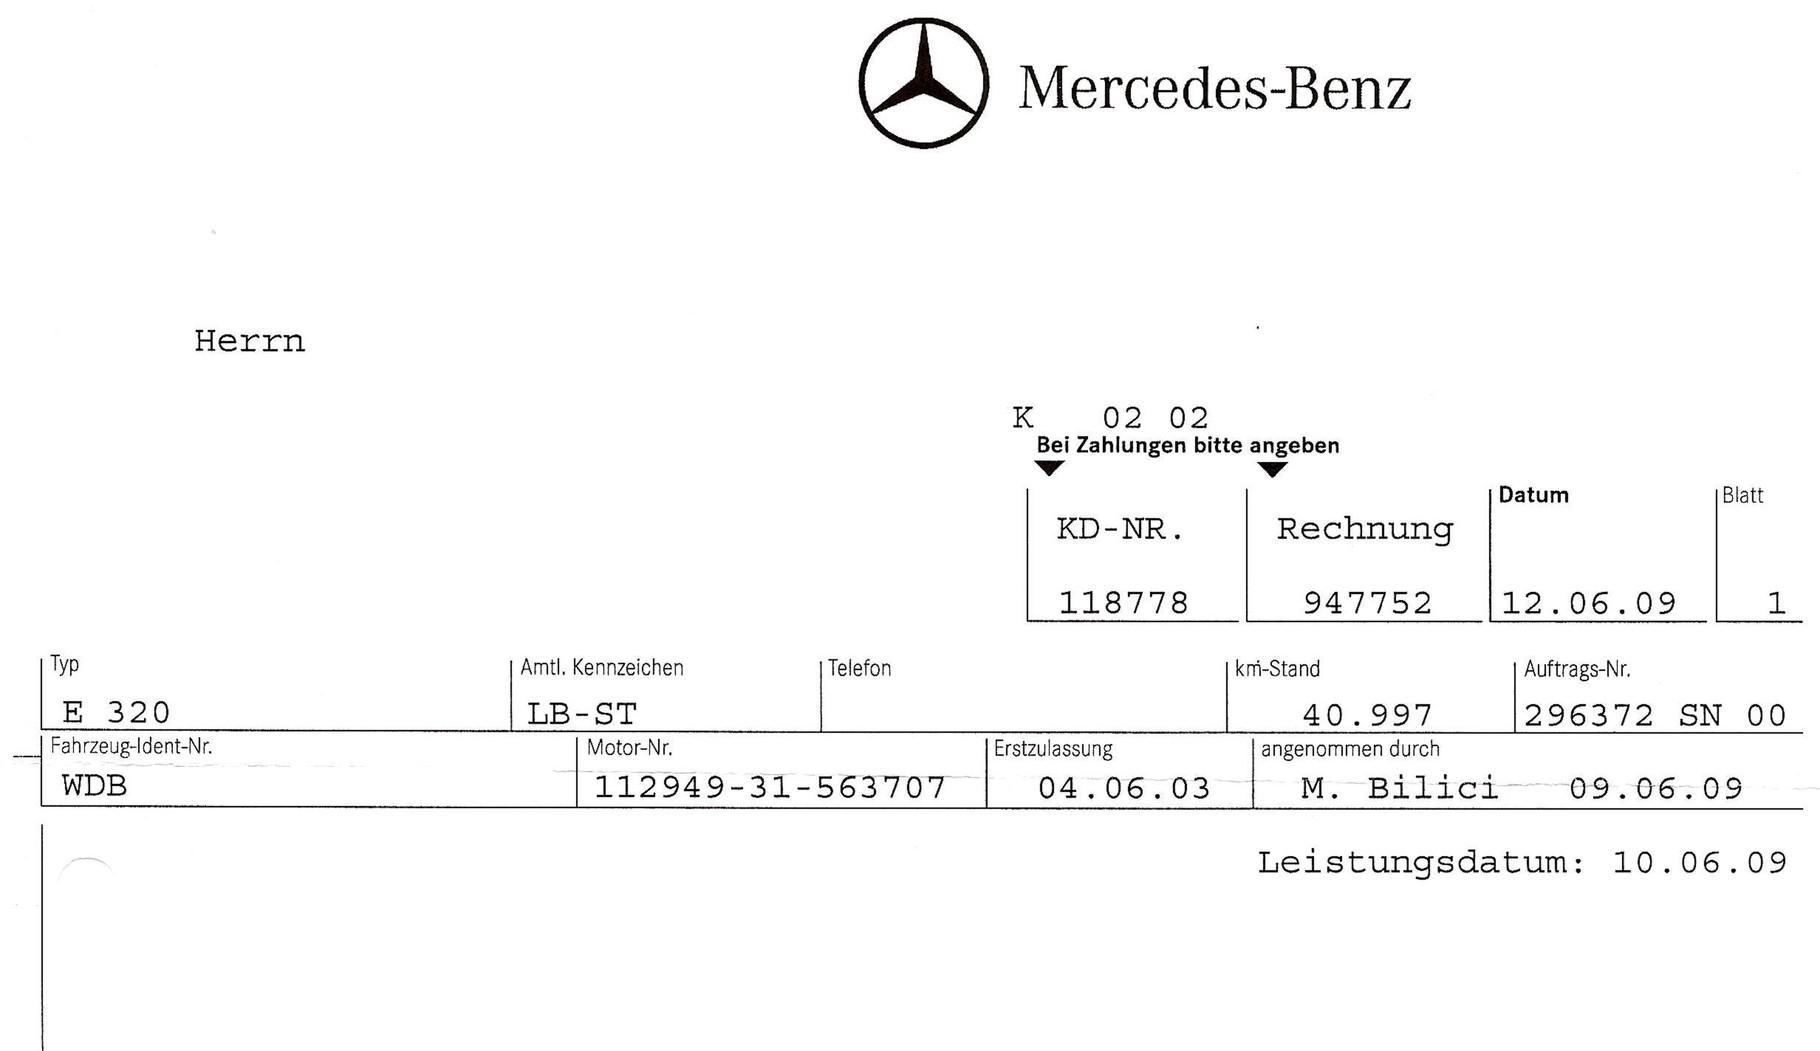 Vertrag Rechnung Sur Automobilefr Autoscout24fr